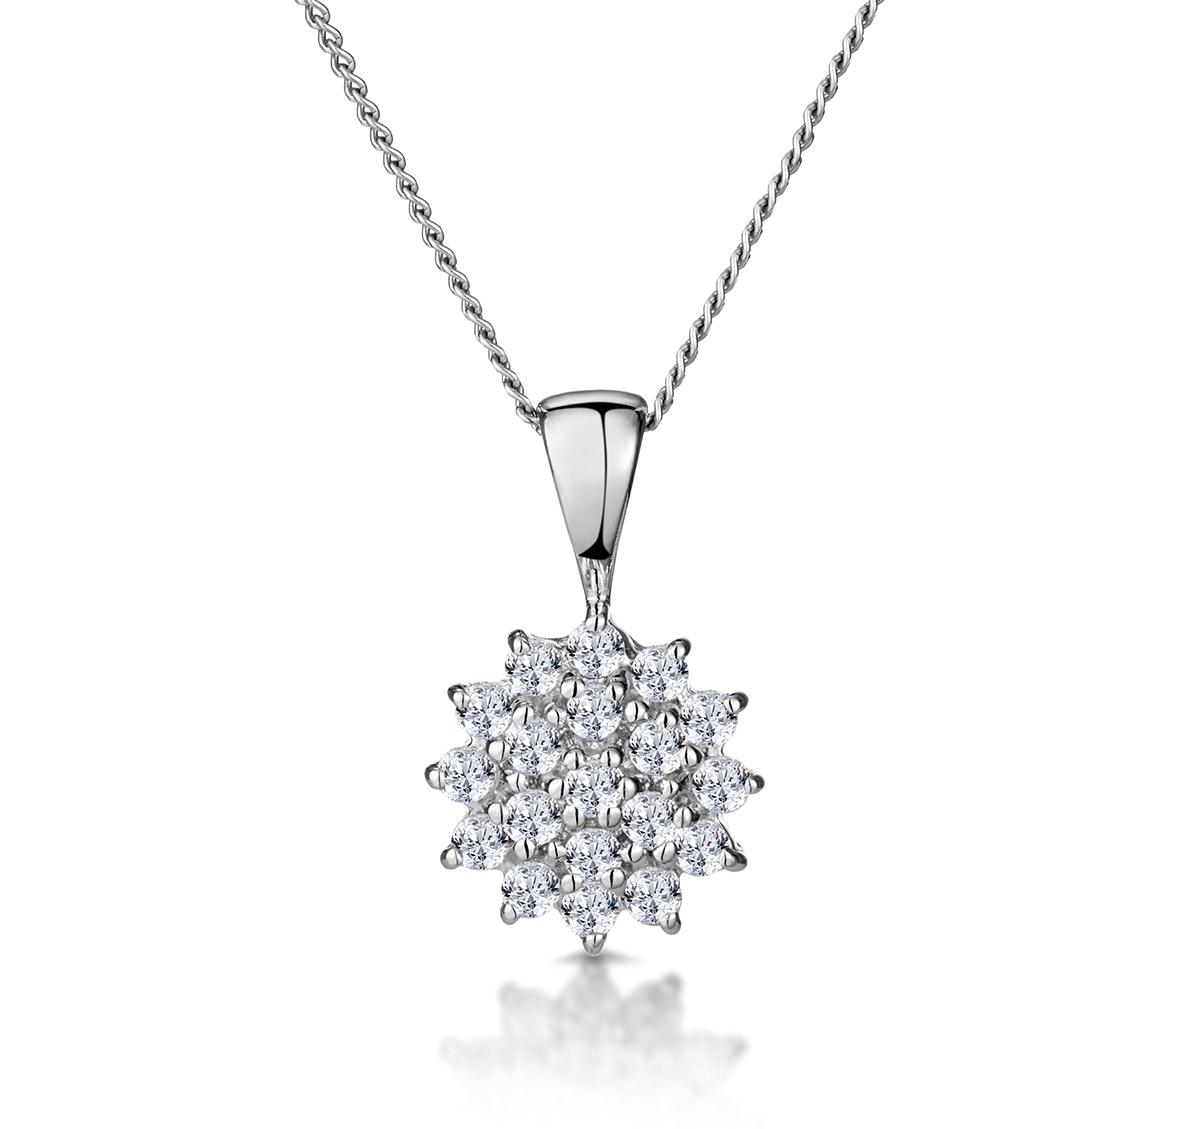 9K White Gold Pendant With 0.25ct Diamonds